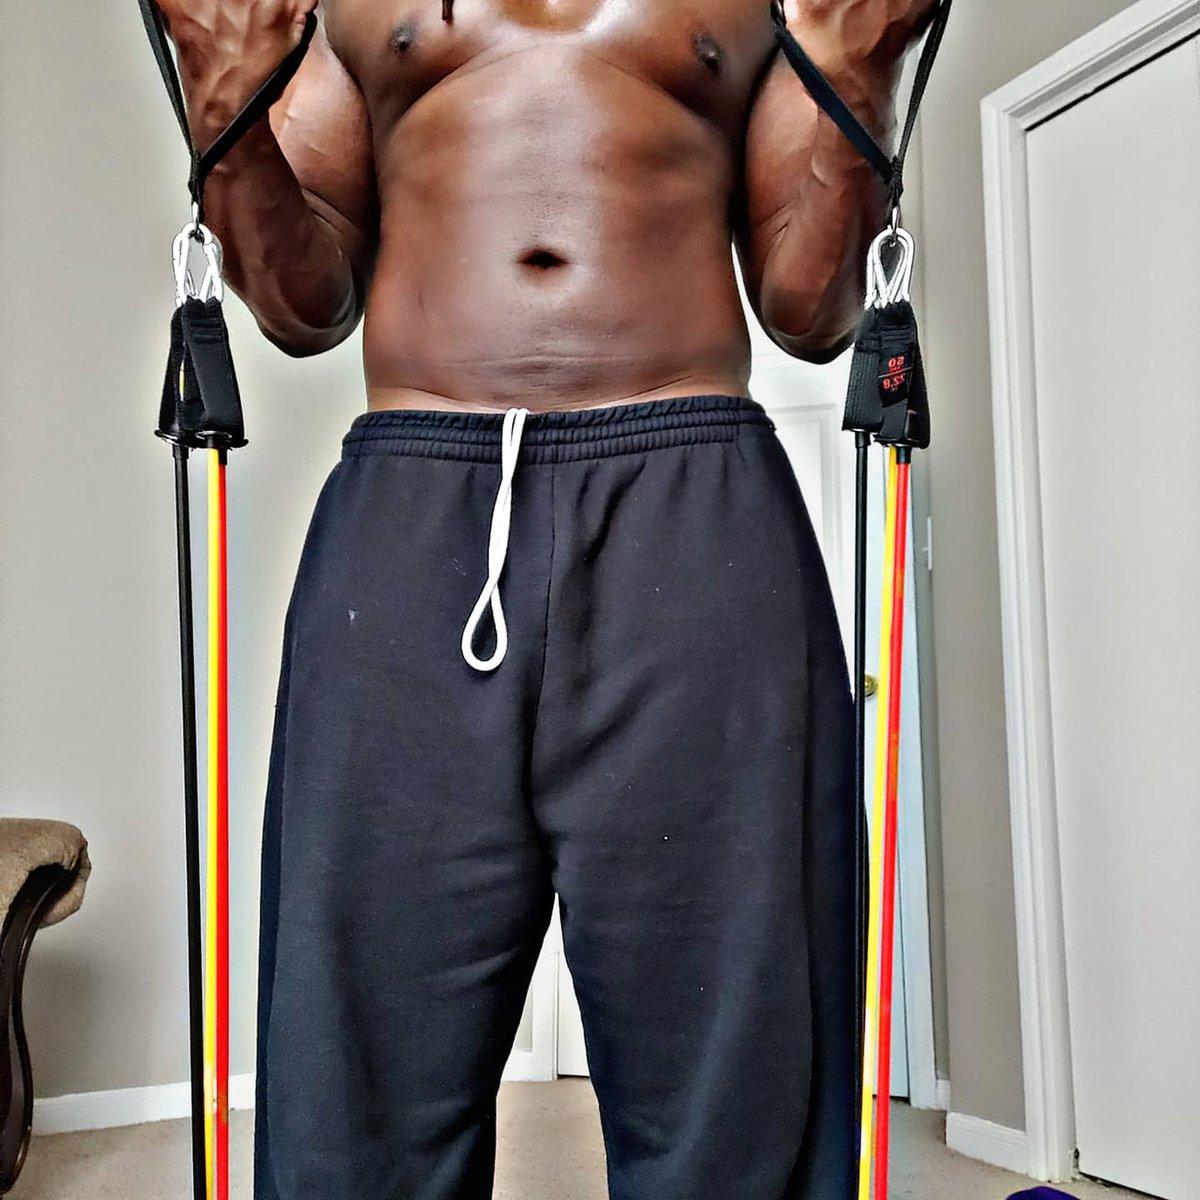 195 and still taking form 🍫💪🏾🔥. Ask about my 3-Day Trial Program.  #herbalifecoach #healthcoach #wrllnesscoach #healthylifestyle #healthyliving #healthandwellness #healthandfitness #getfit #getlean #musclegrowth #positivevibes #positivity #melanin #sundaeonafriday #sexymufugga https://t.co/3nYYtHwowf